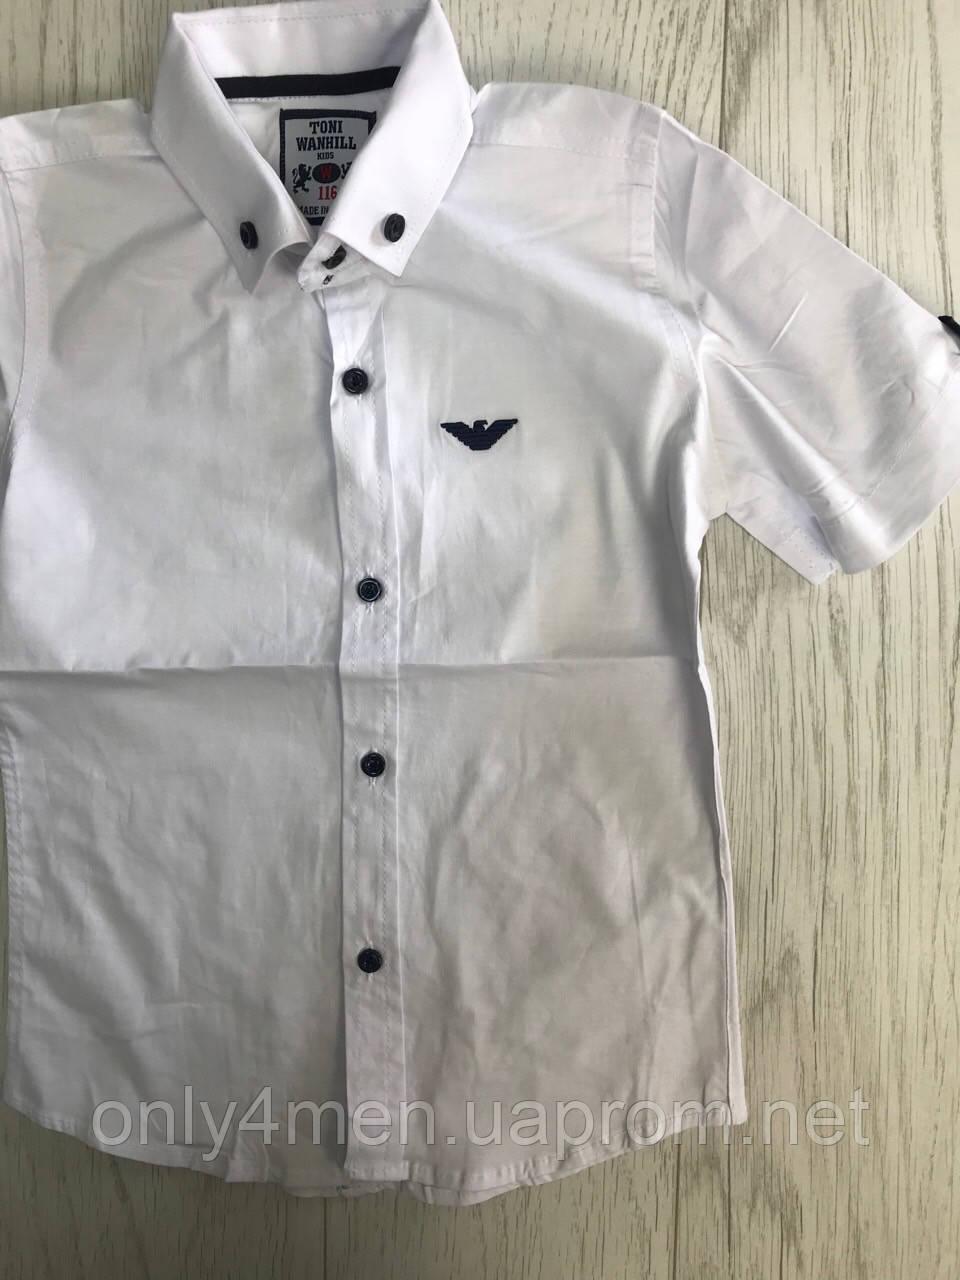 Рубашка с коротким рукавом для мальчика 116-164 см